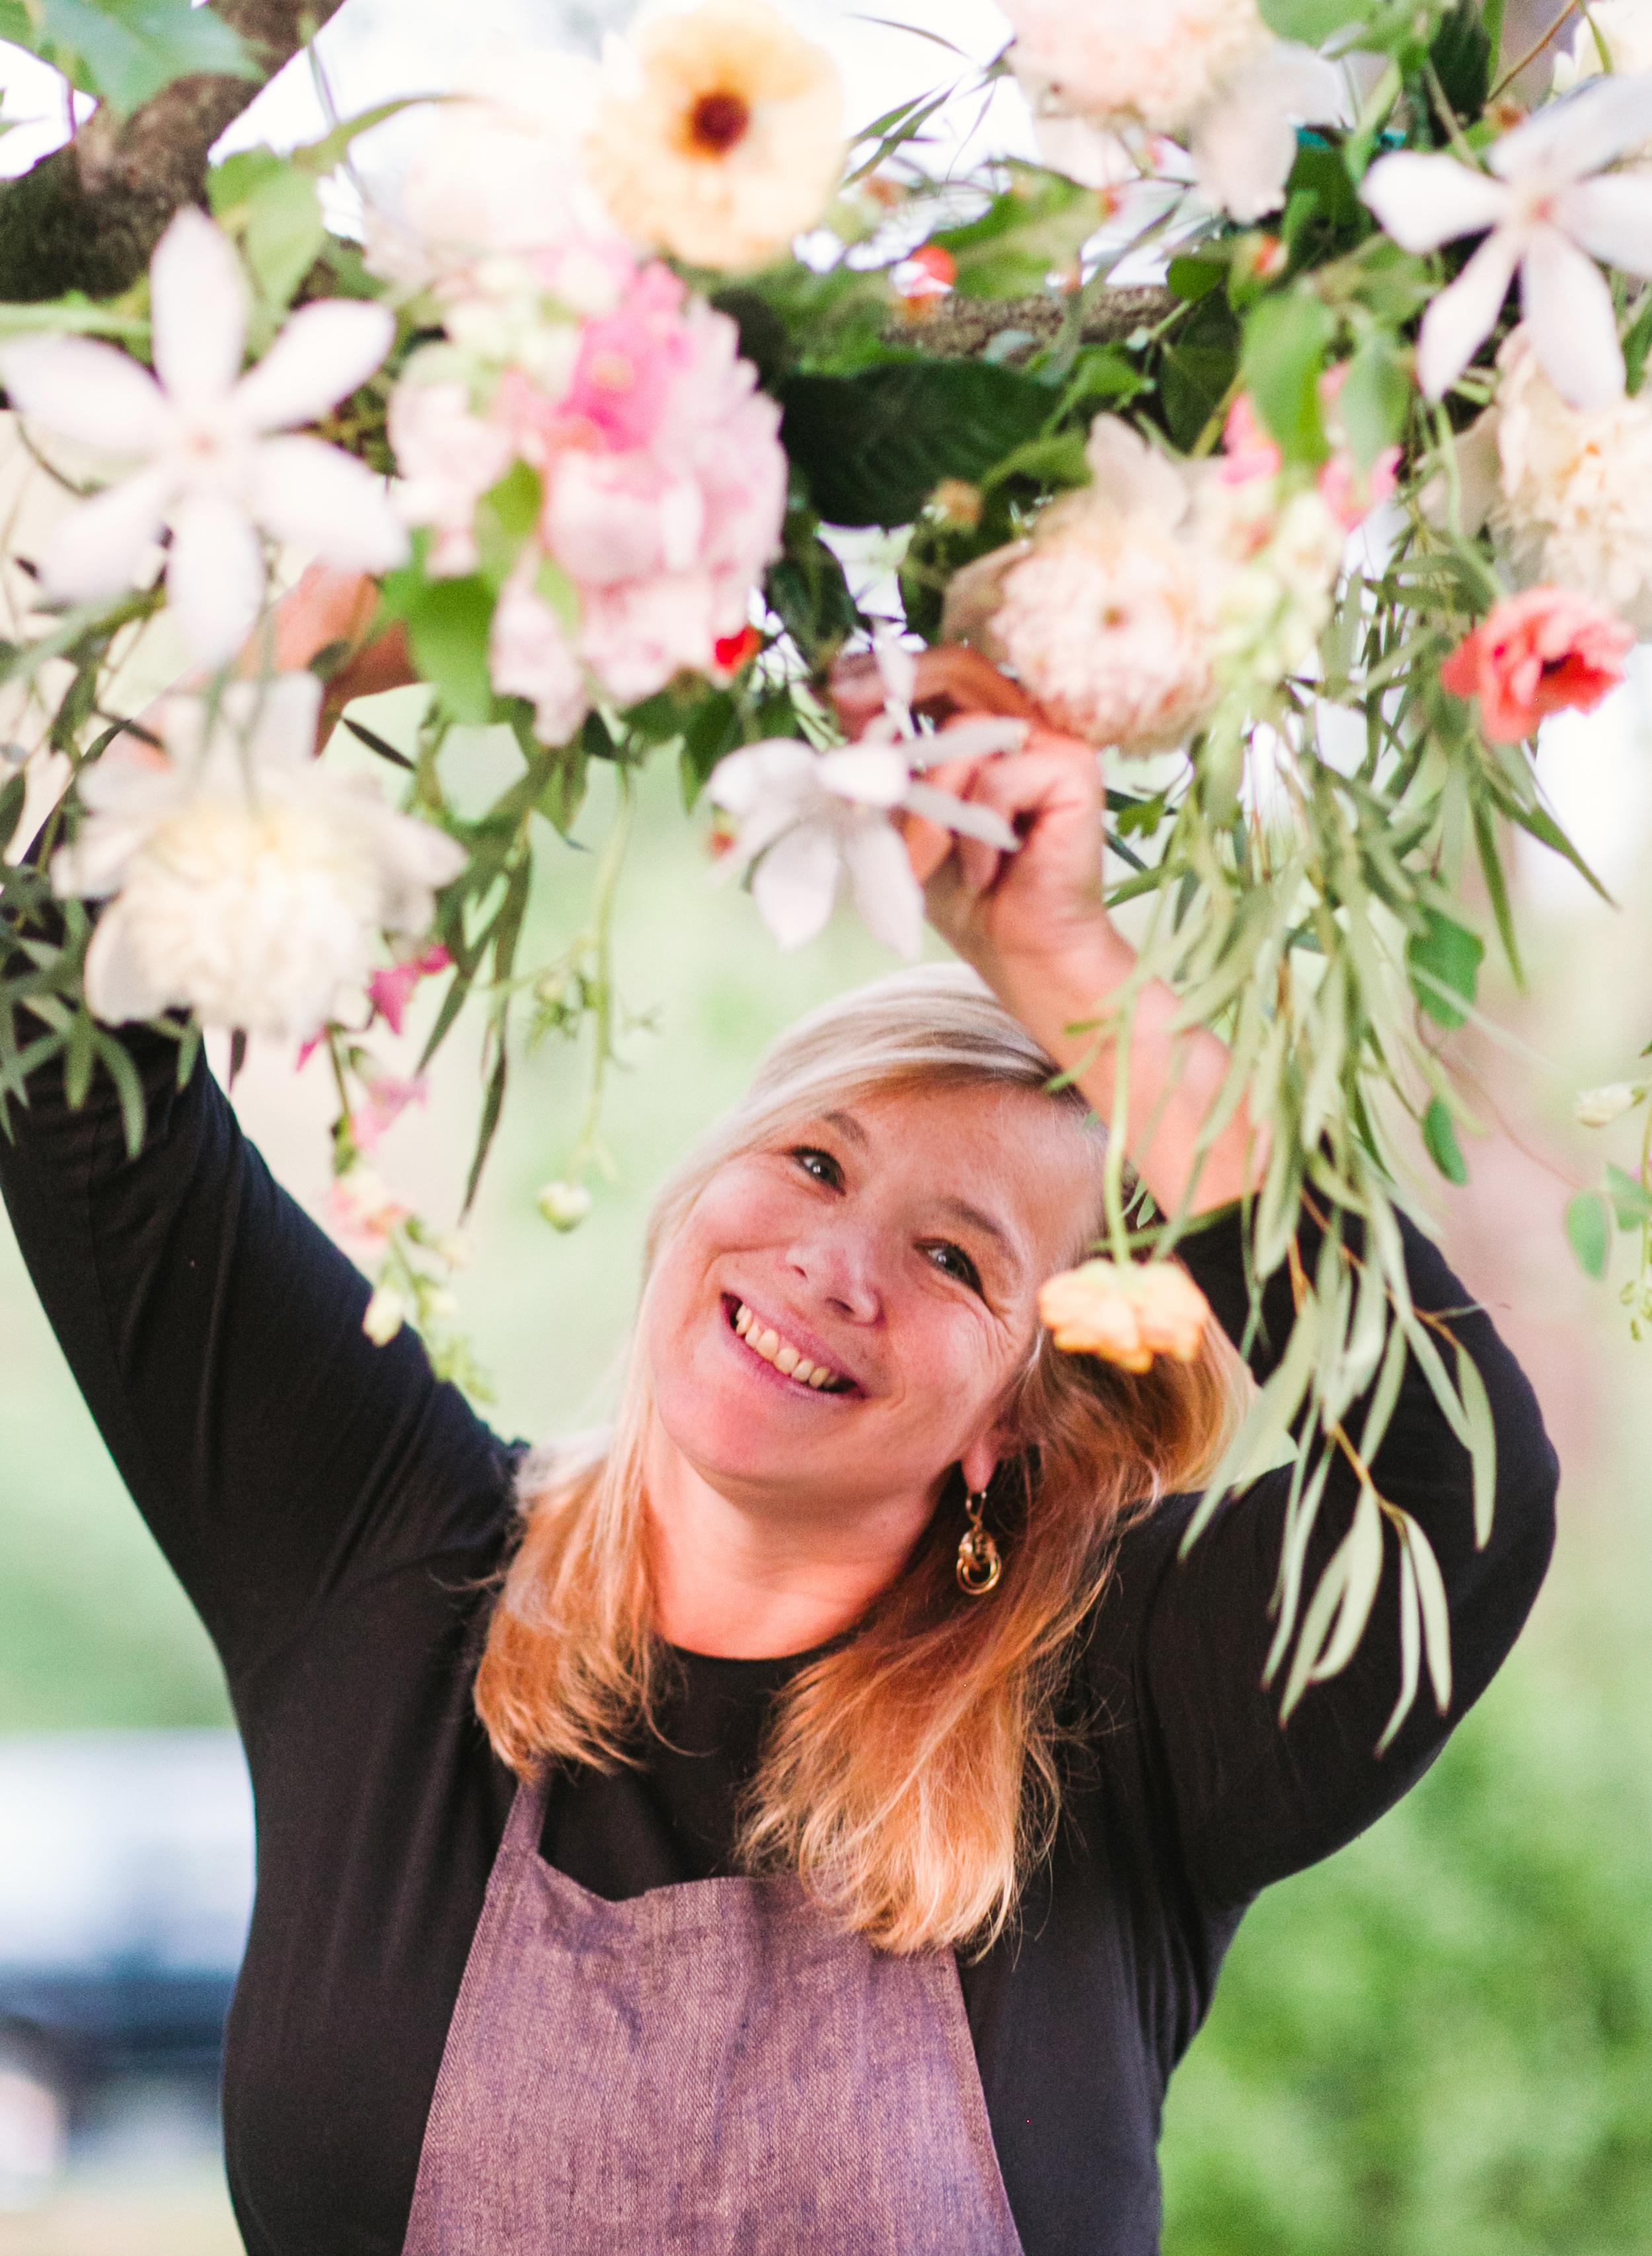 Holly Heider Chapple, founder and creative director of Loudoun Weddings.